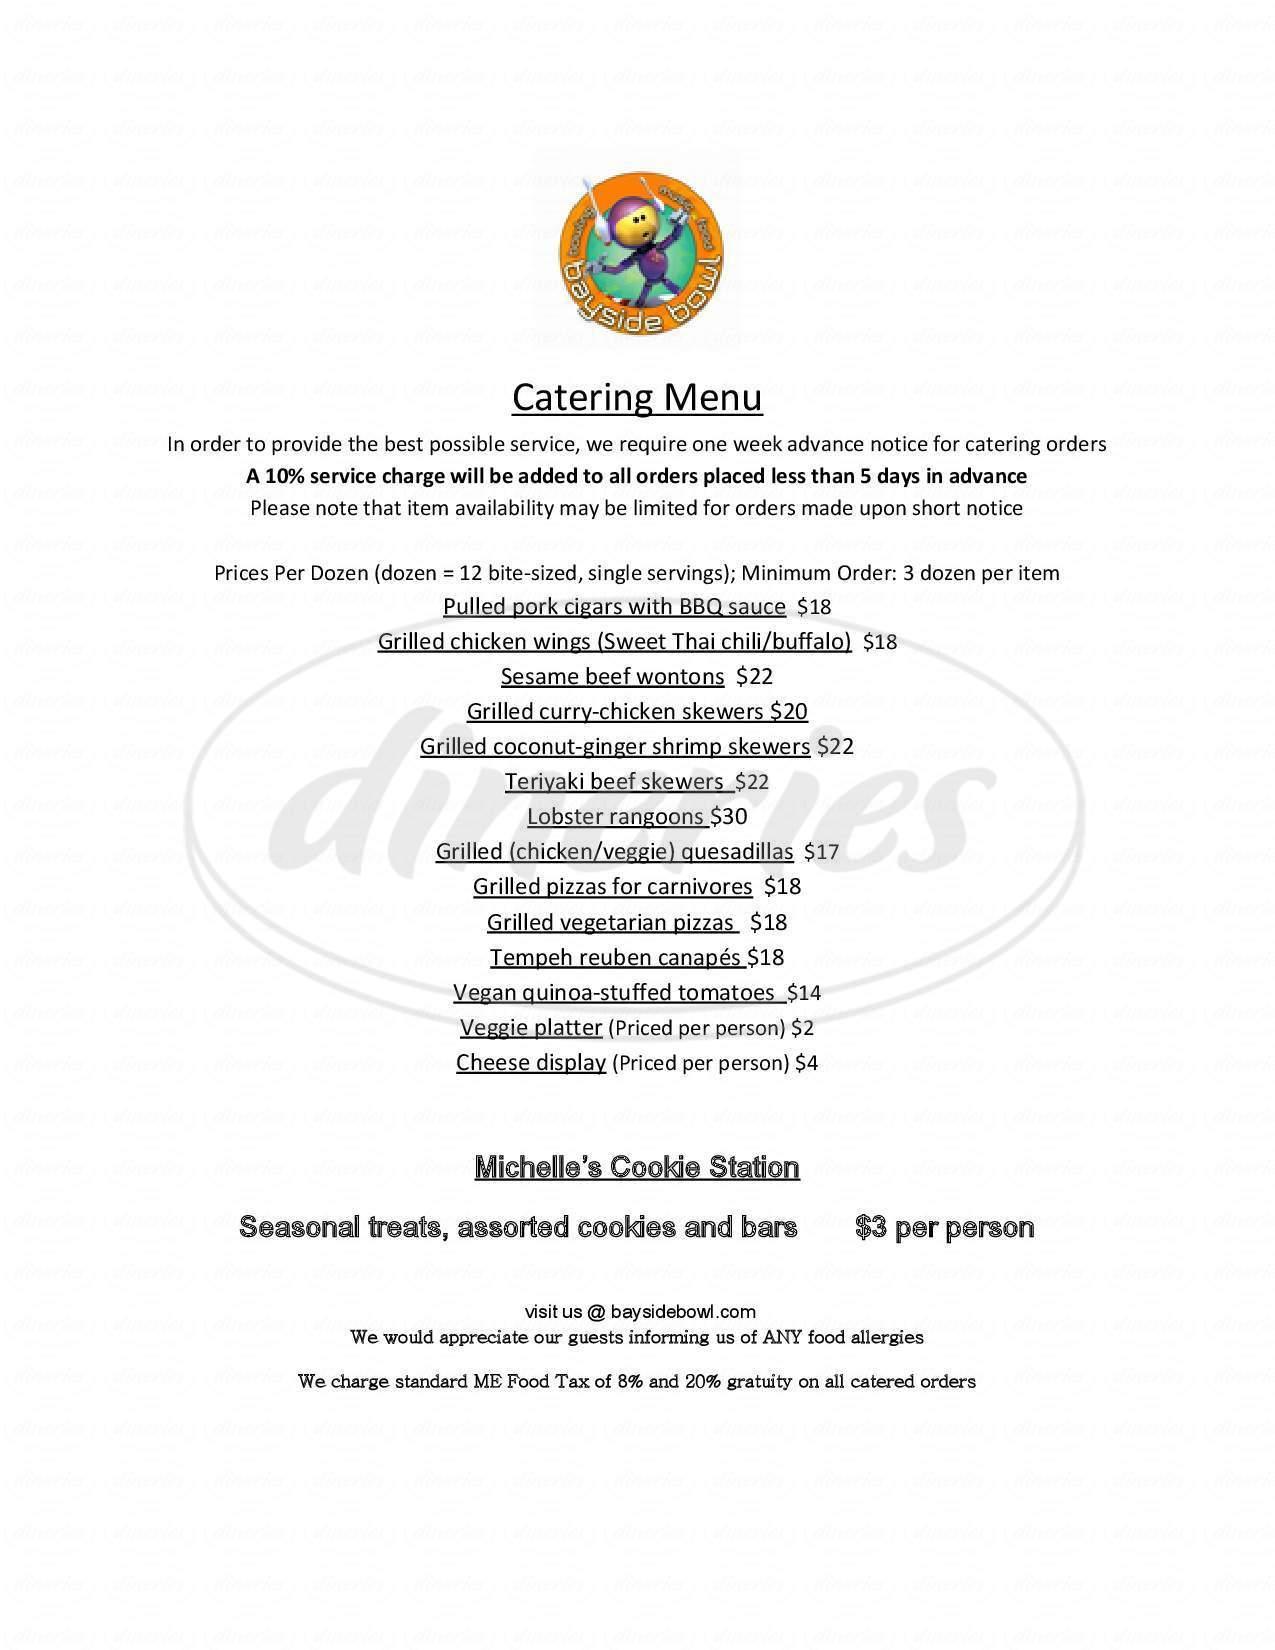 menu for Bayside Bowl